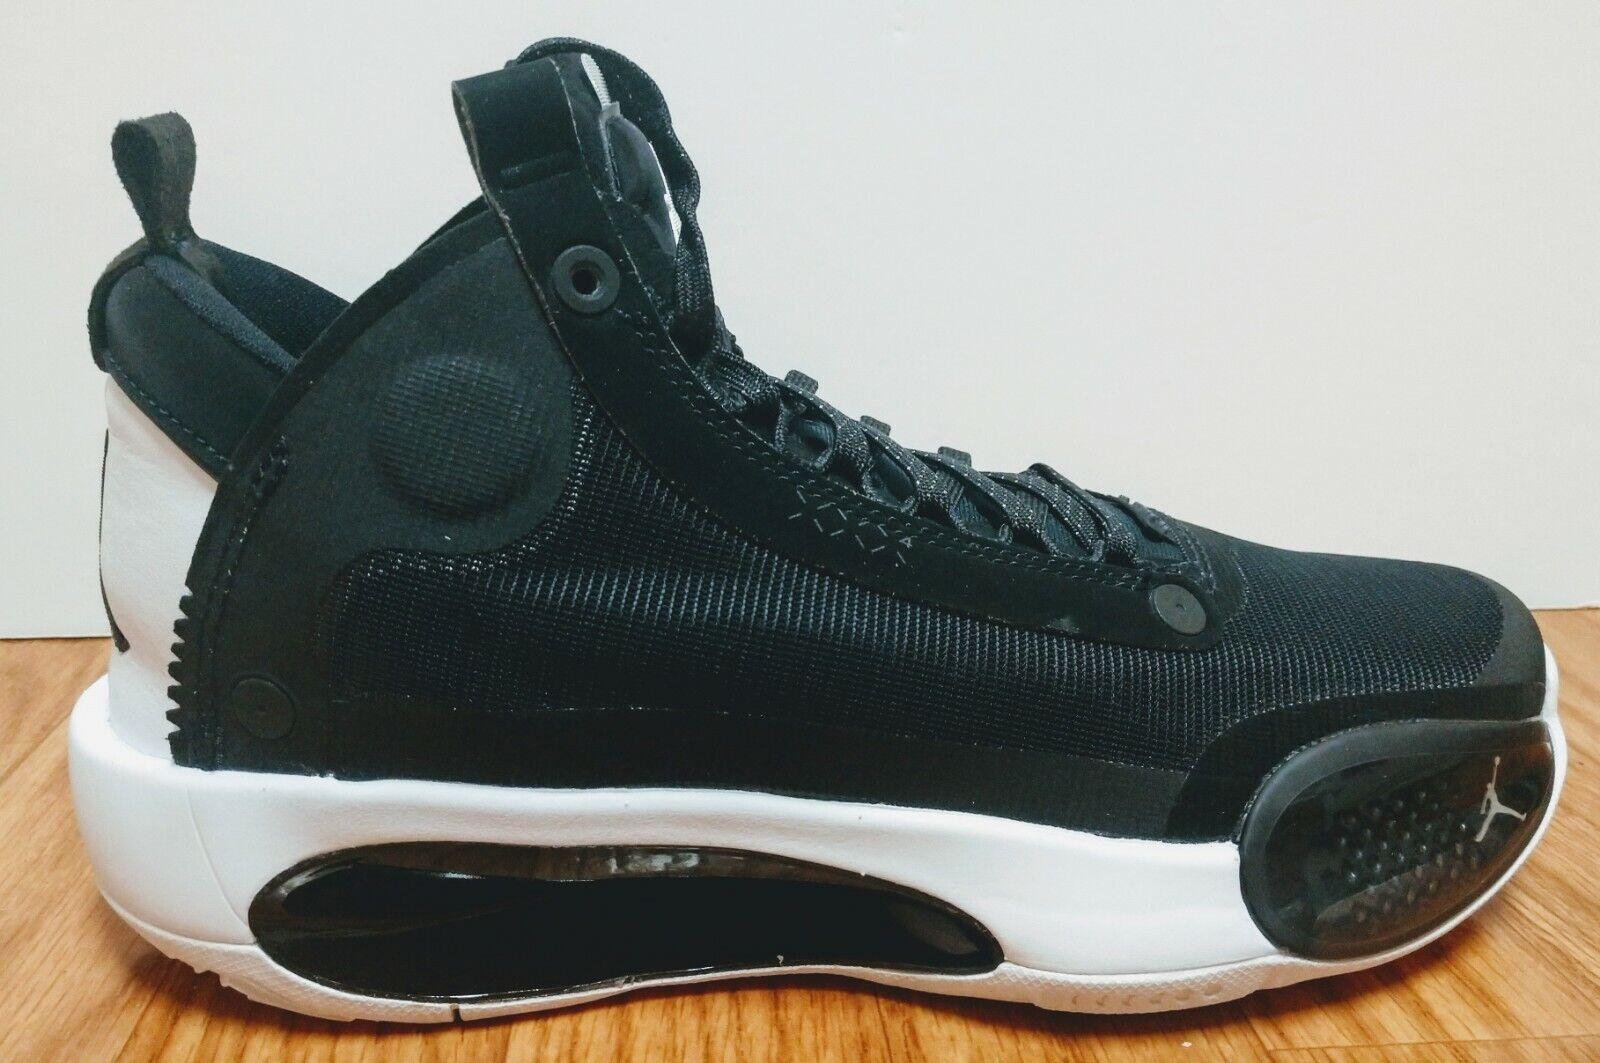 Vachetta Tan Basketball Shoes